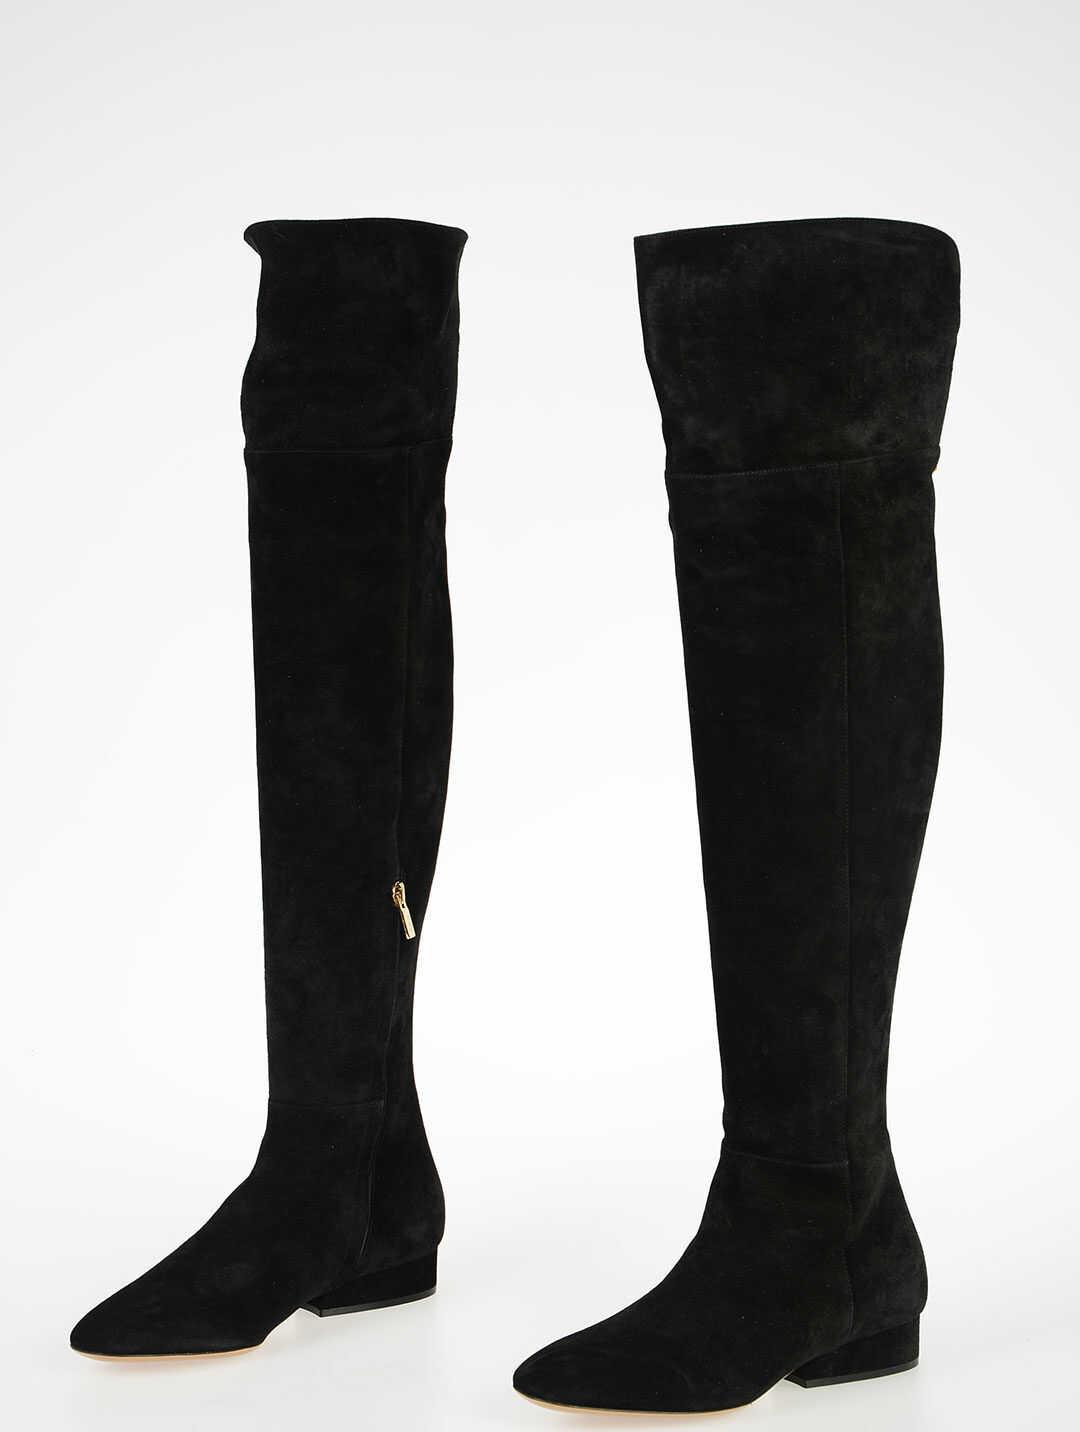 Salvatore Ferragamo Suede Leather CREMONA boots BLACK